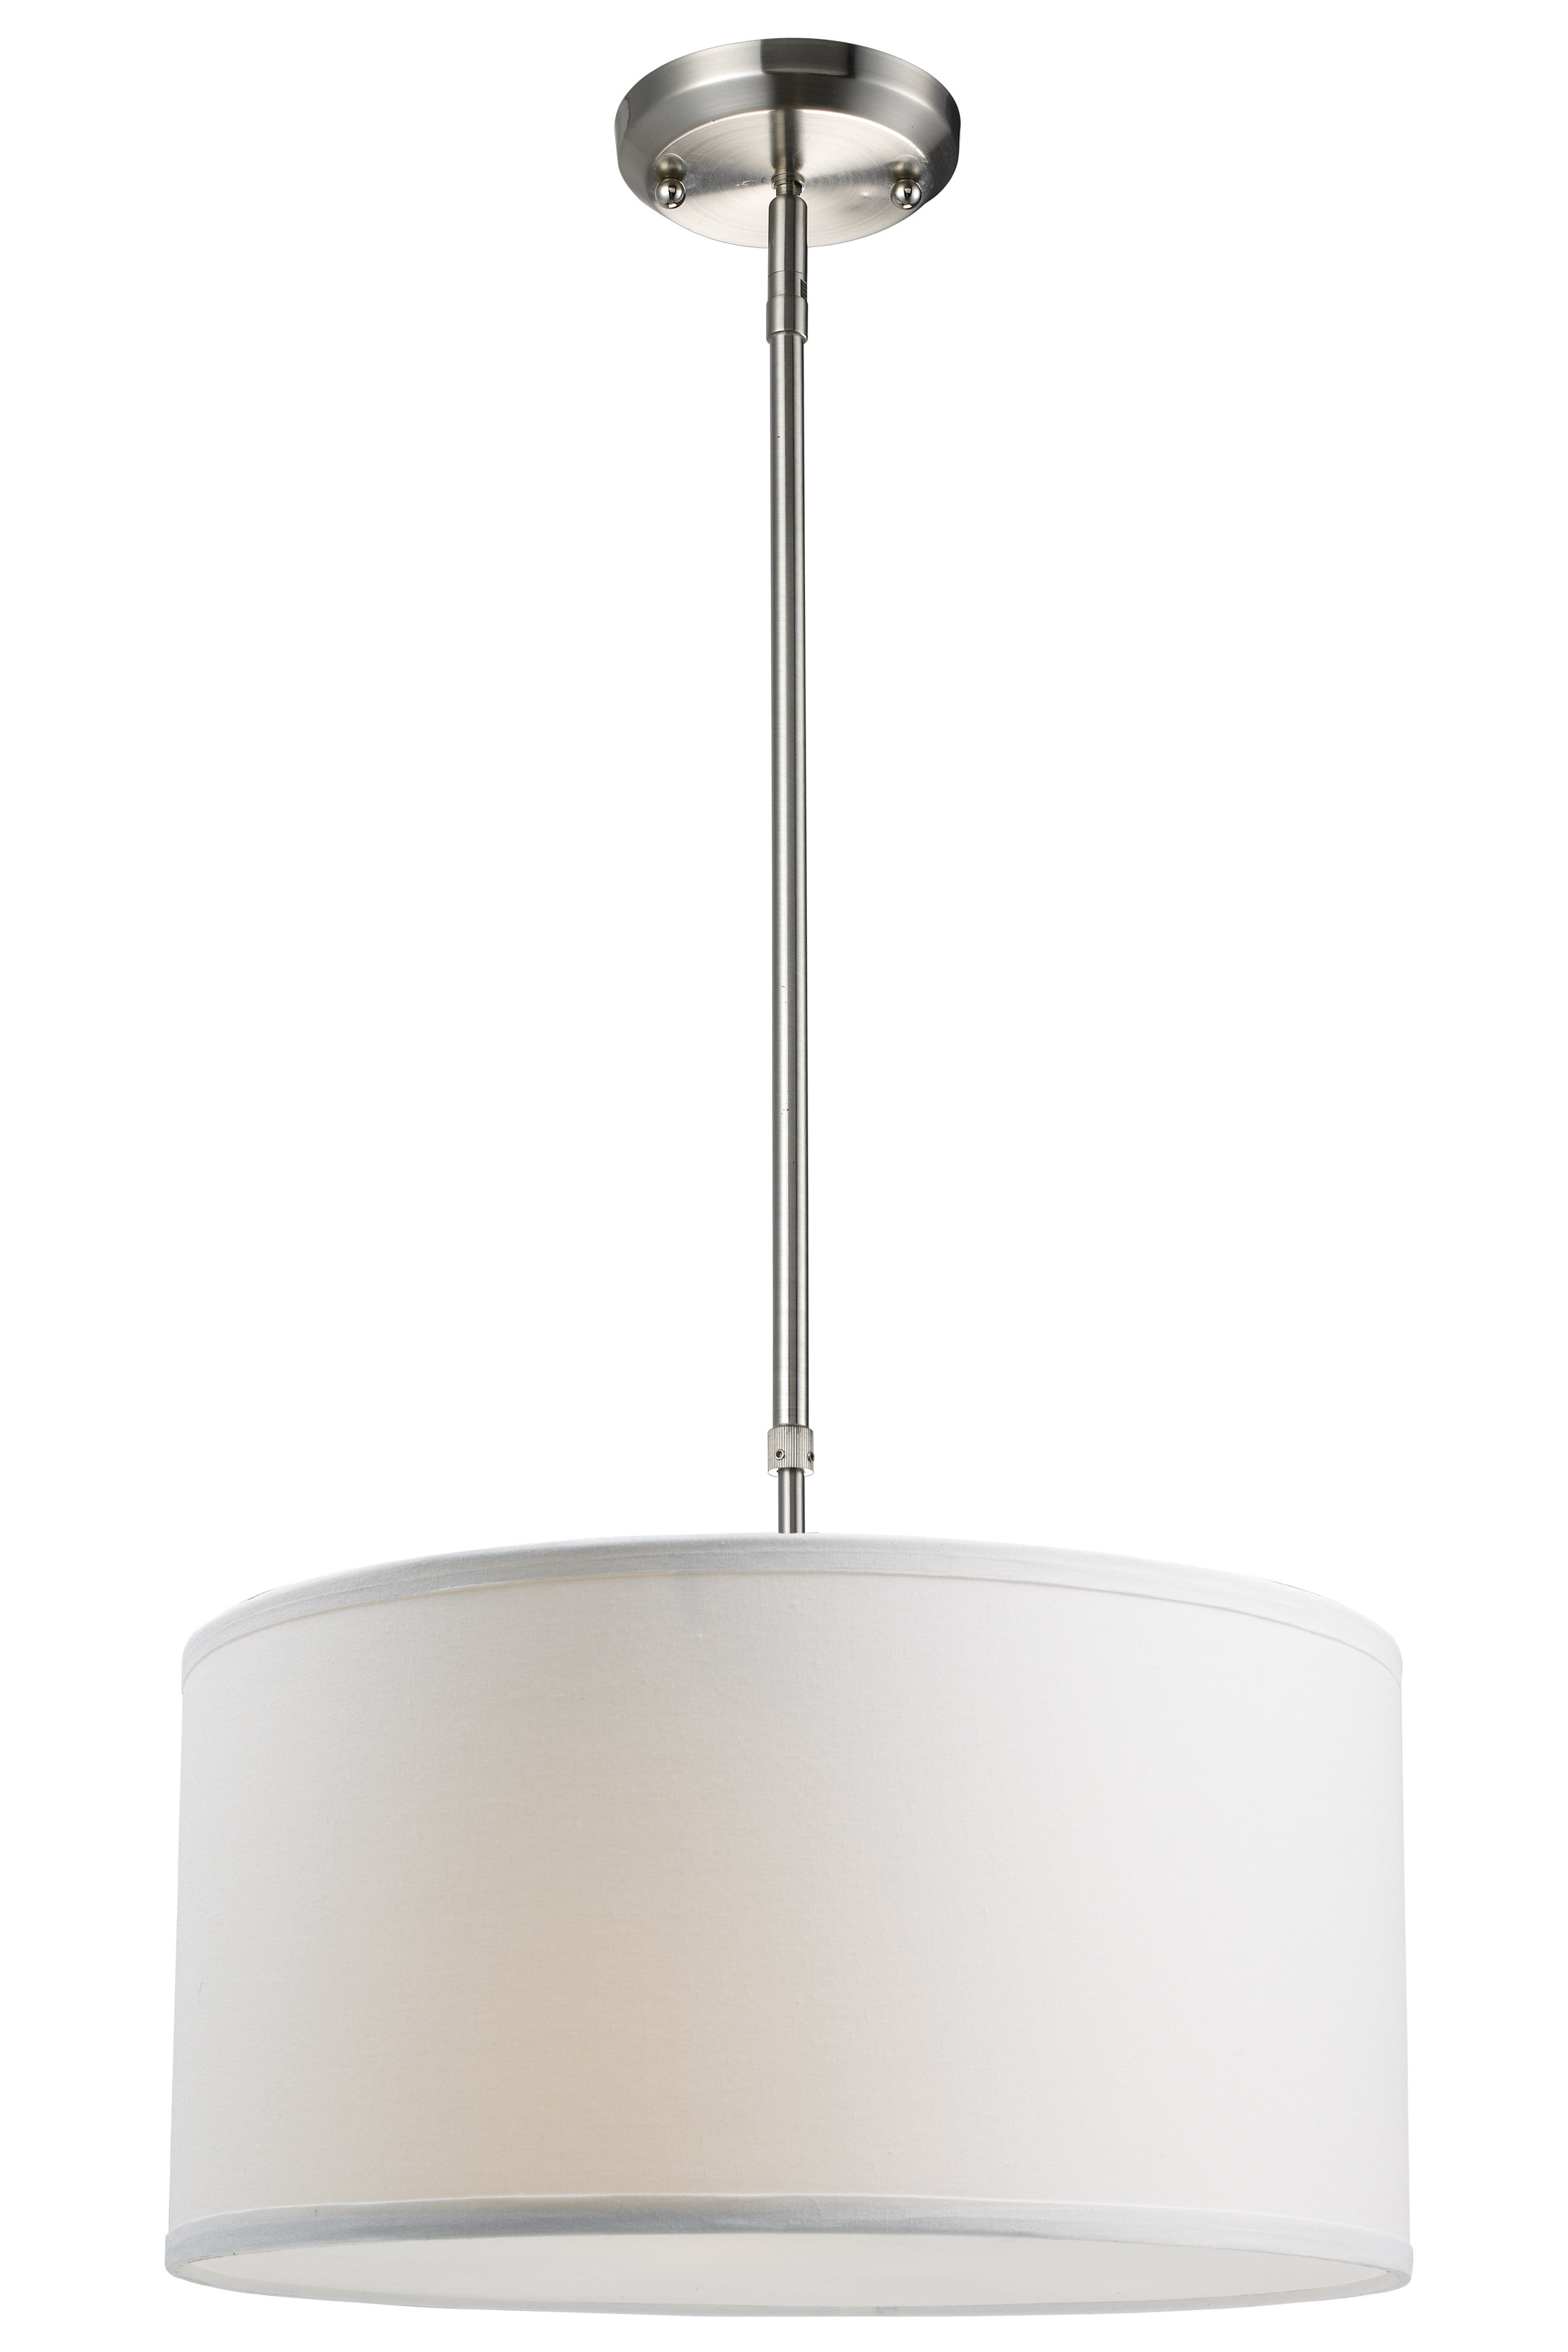 Latest Modern & Contemporary Cataldo 3 Light Drum Pendant (View 21 of 25)